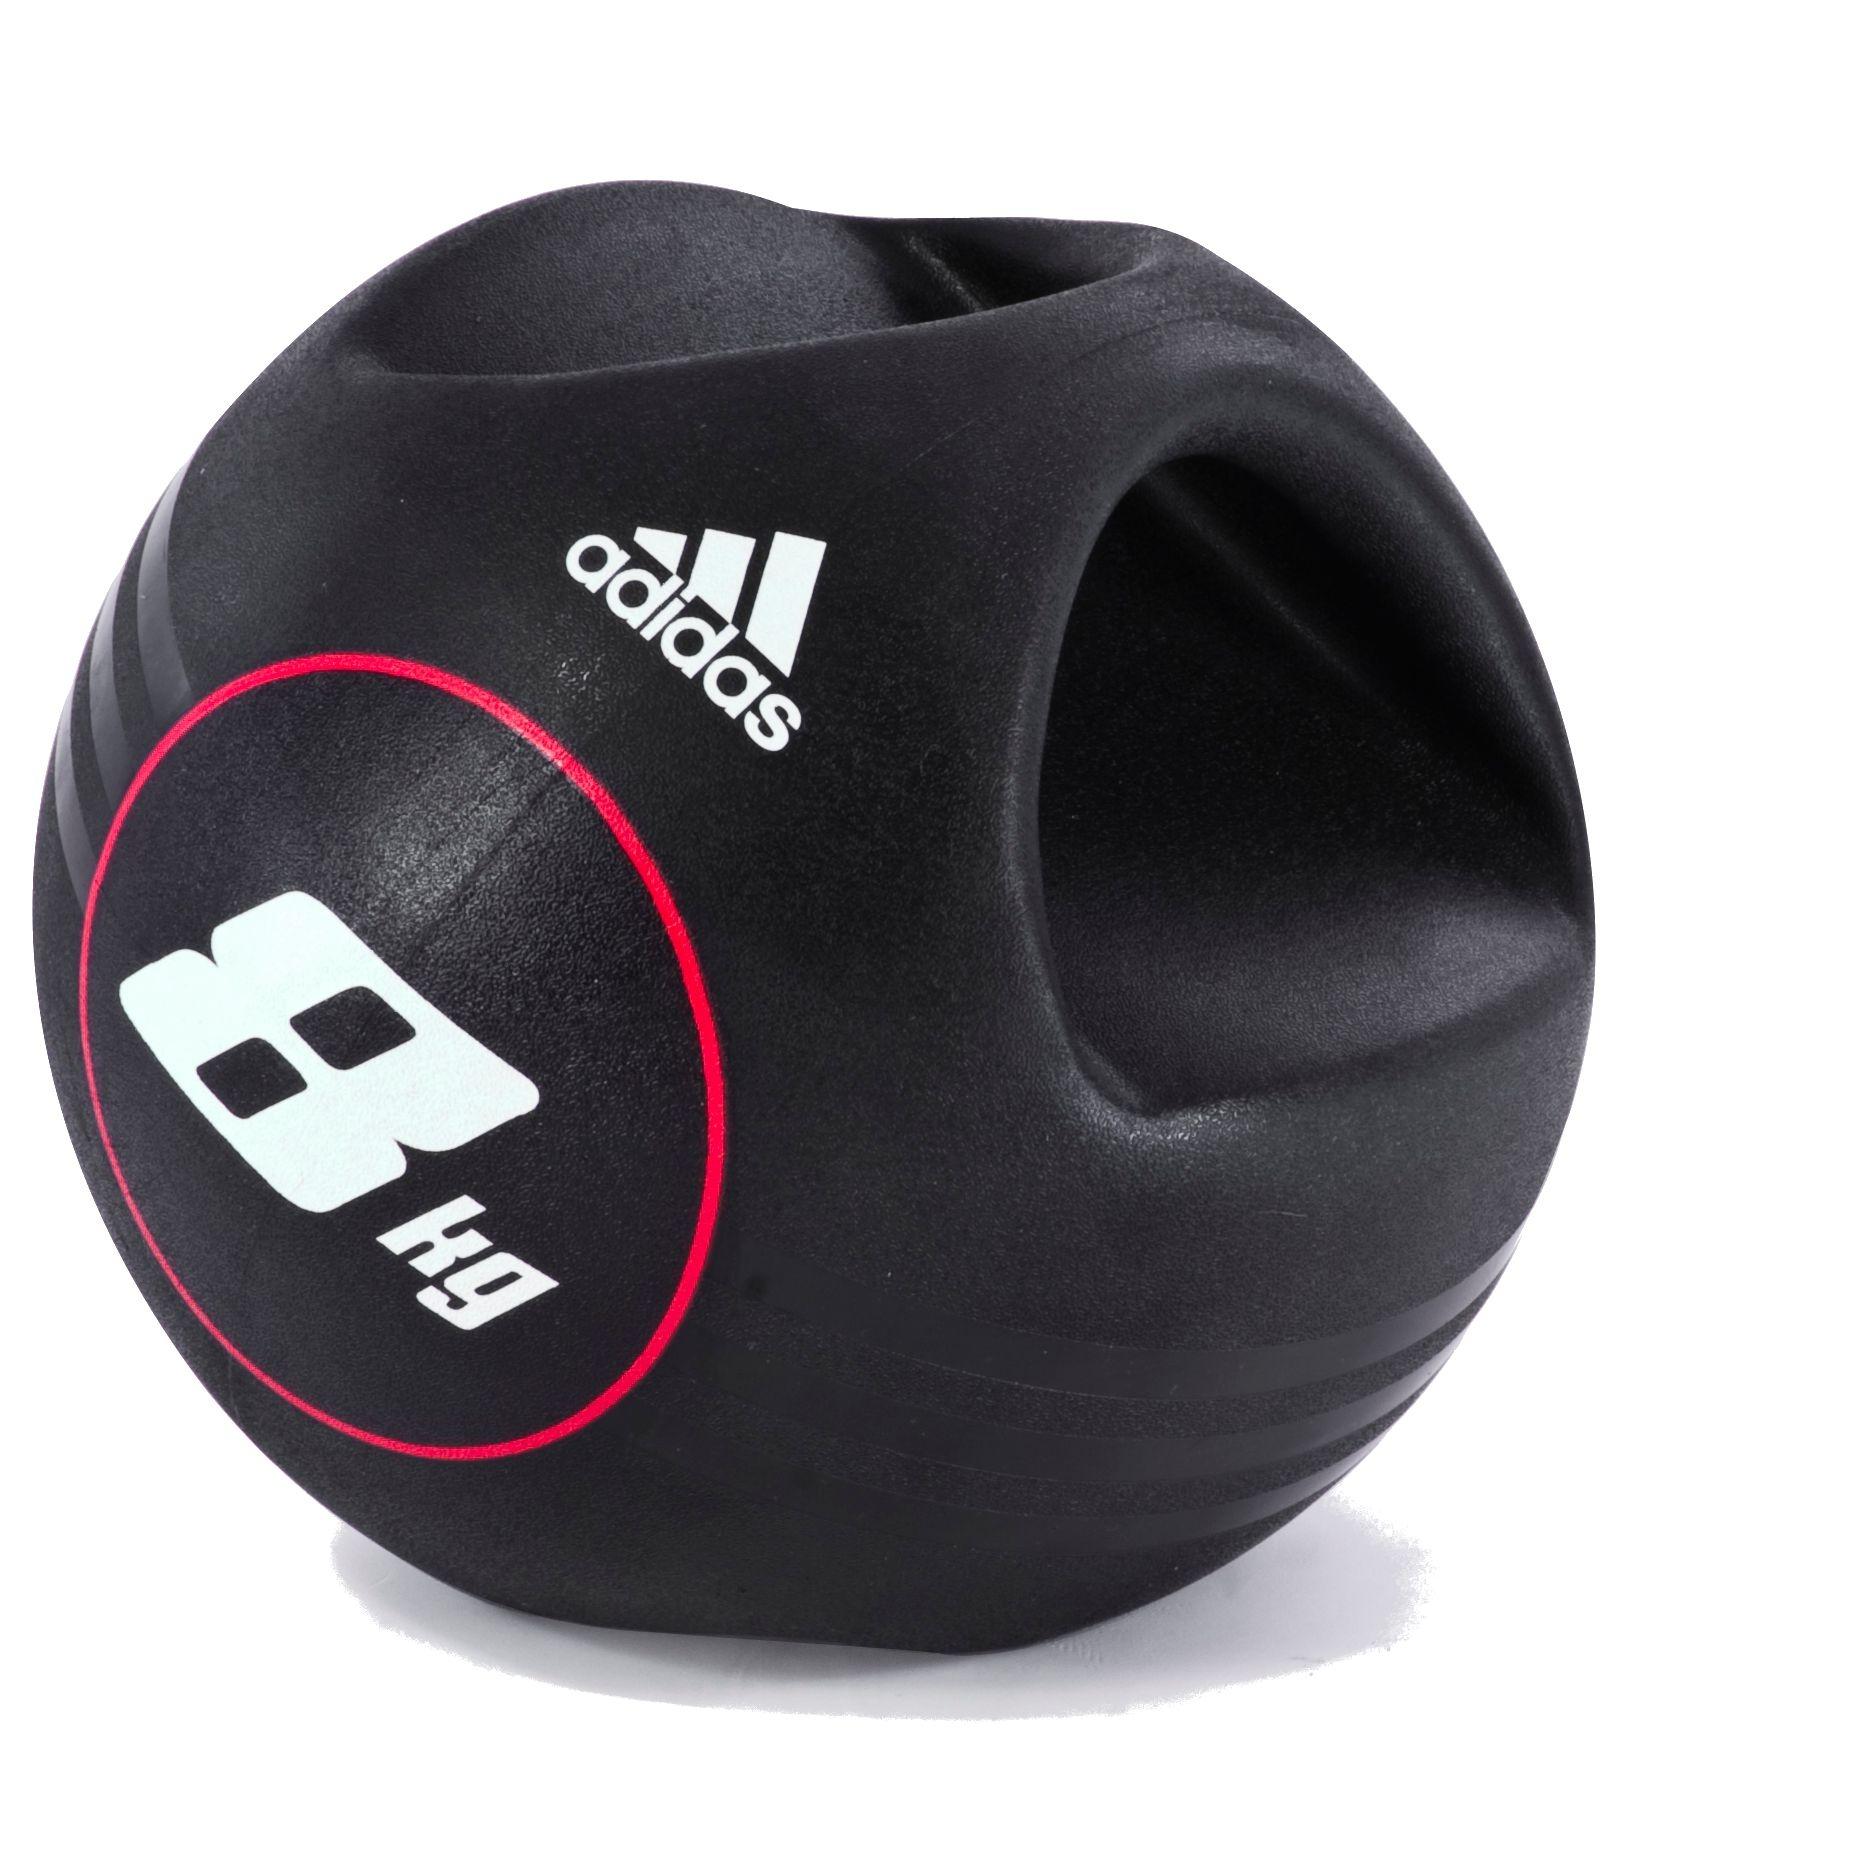 Adidas Dual Grip Medicine Ball  8kg